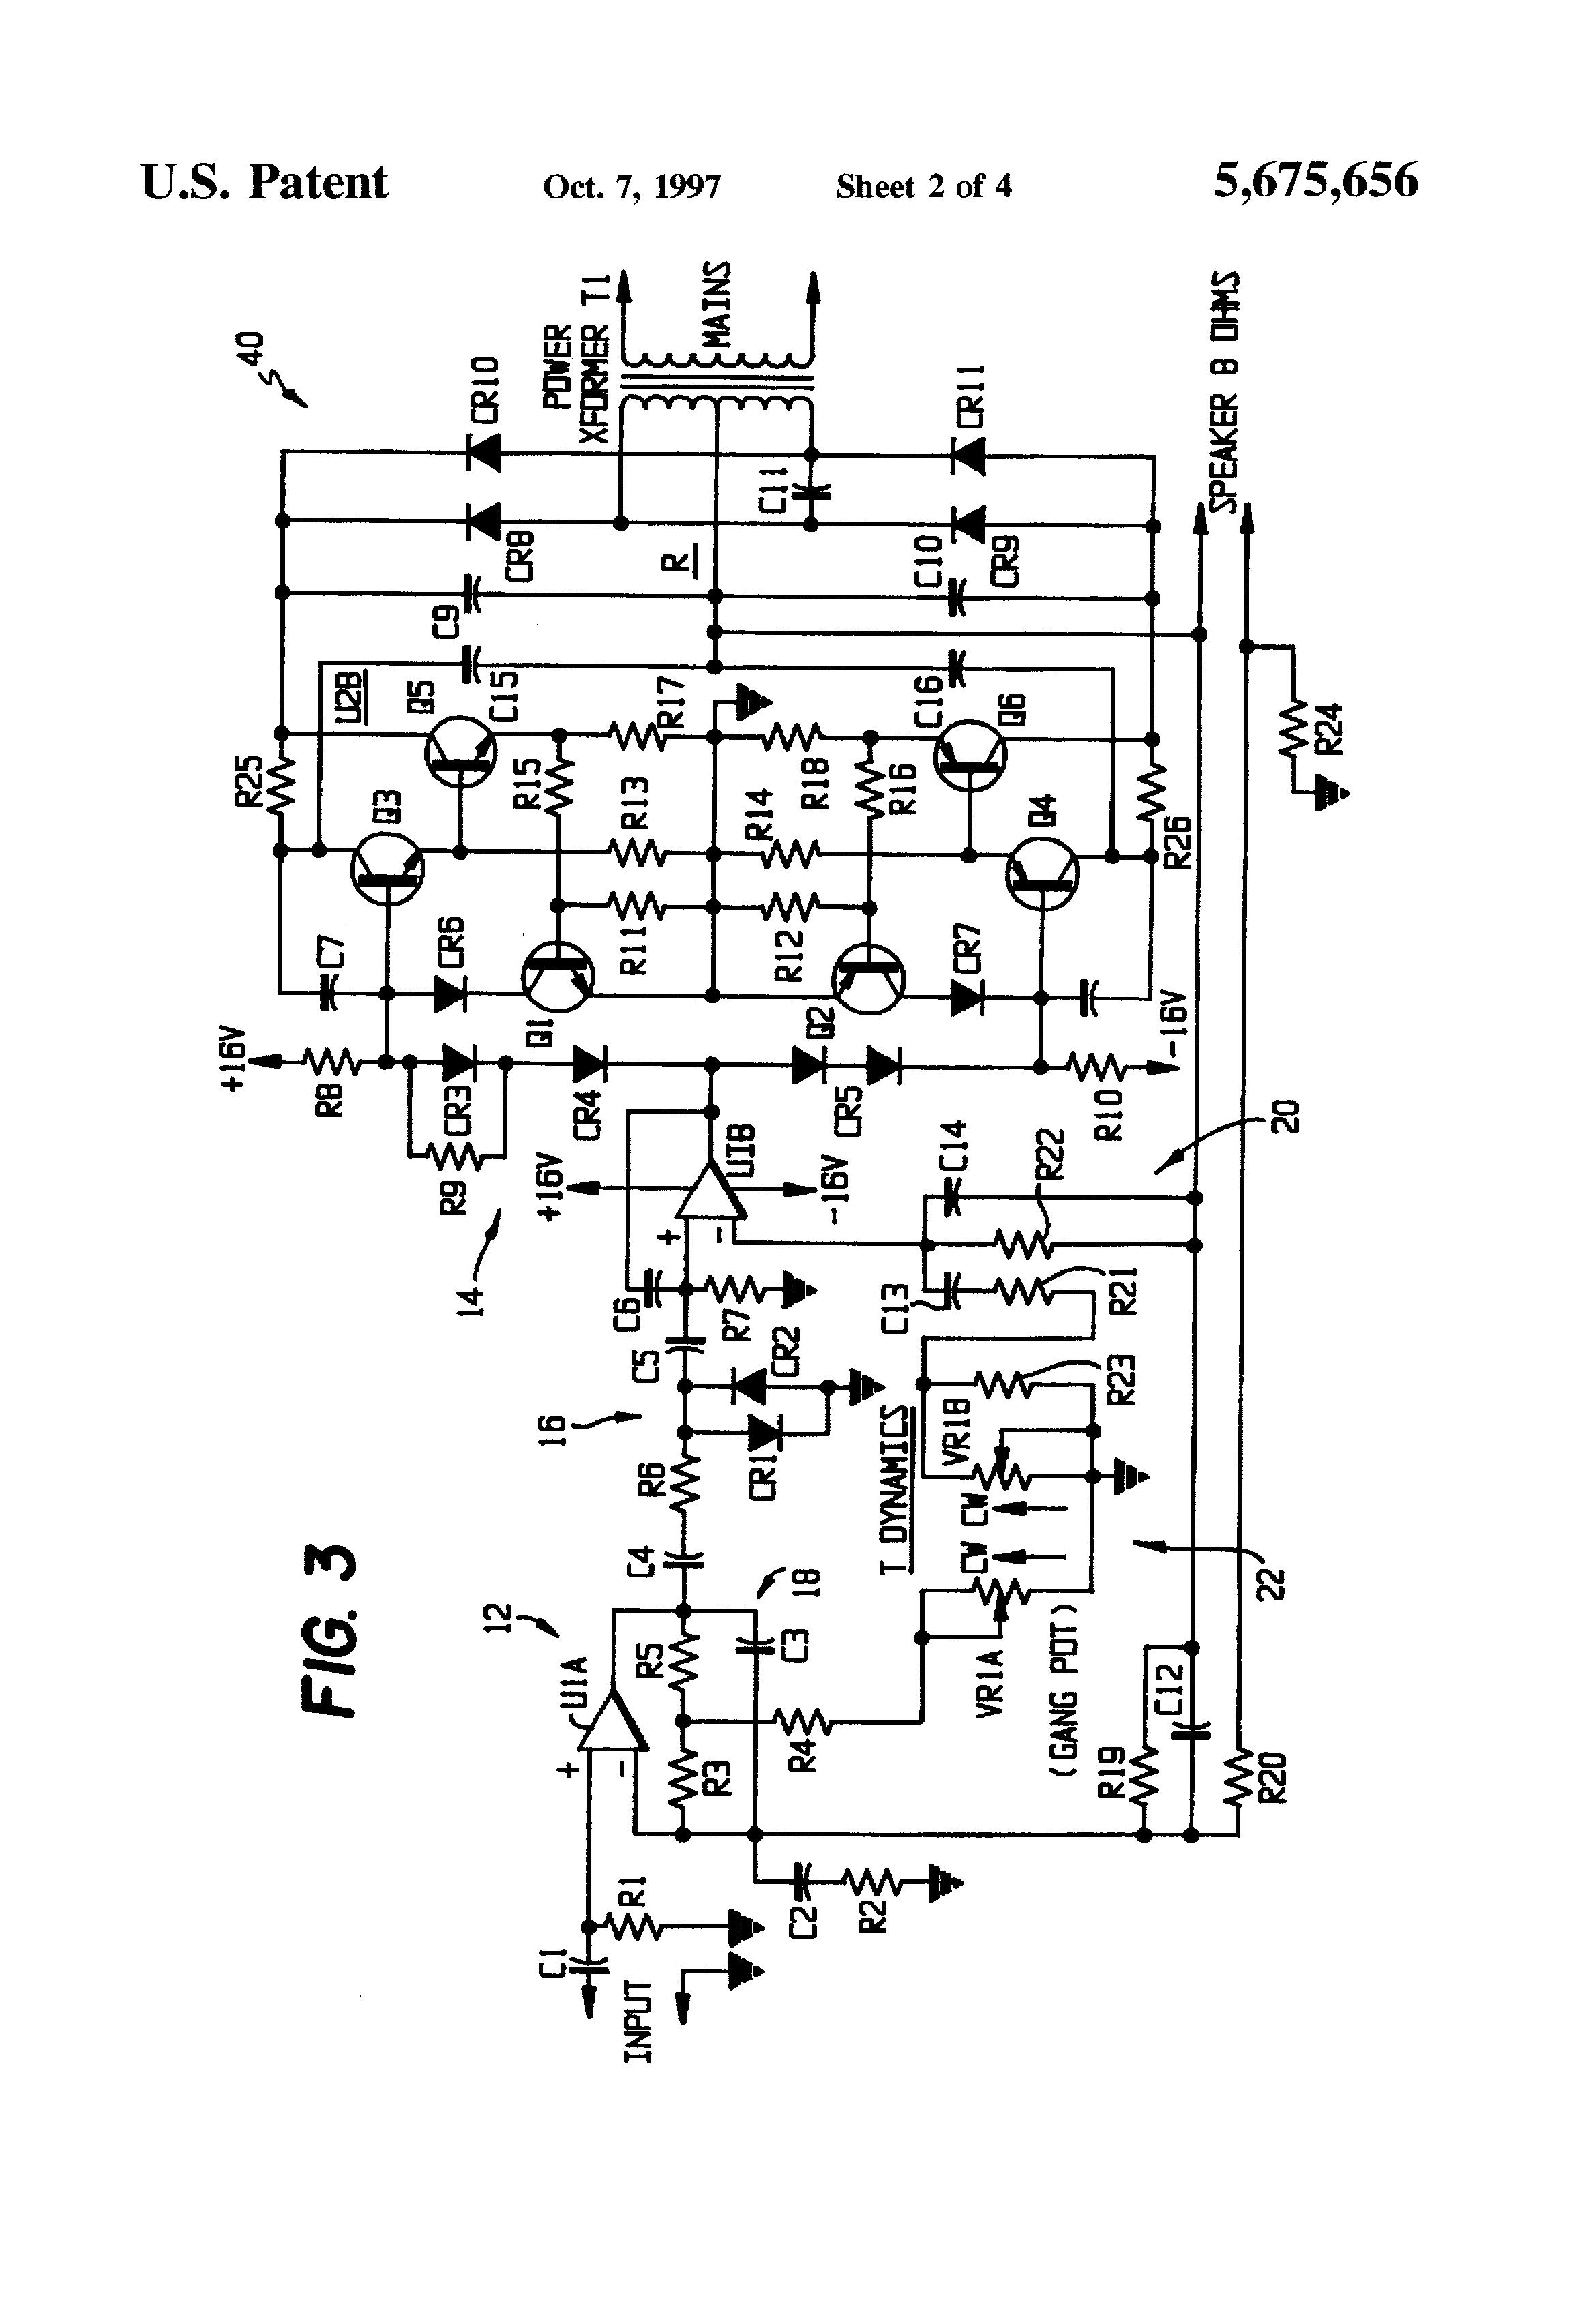 Dayton Hoist Wiring Diagram Crane Welding Sa Wiring Diagram - Dayton hoist wiring diagram